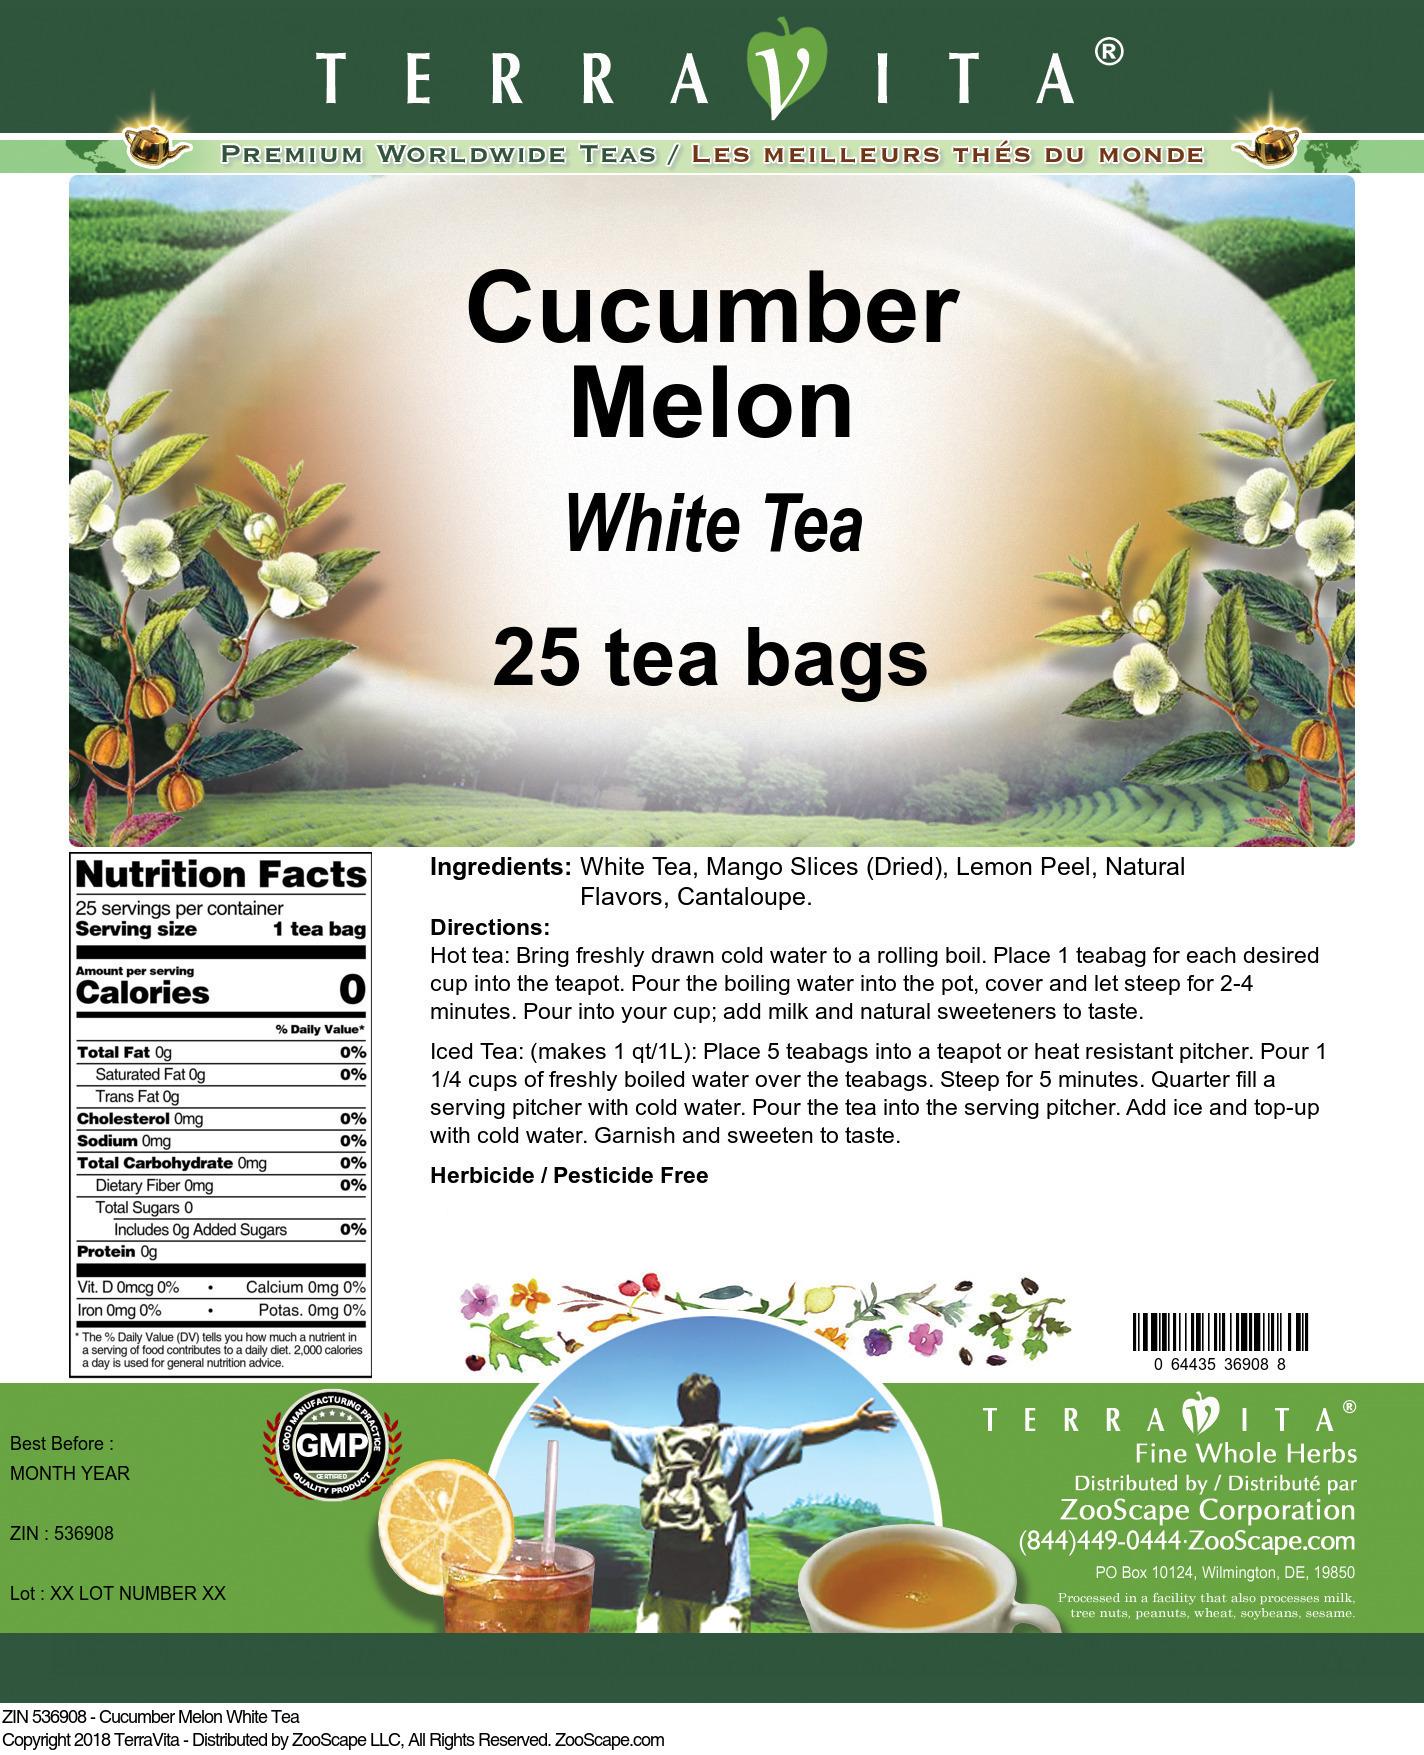 Cucumber Melon White Tea